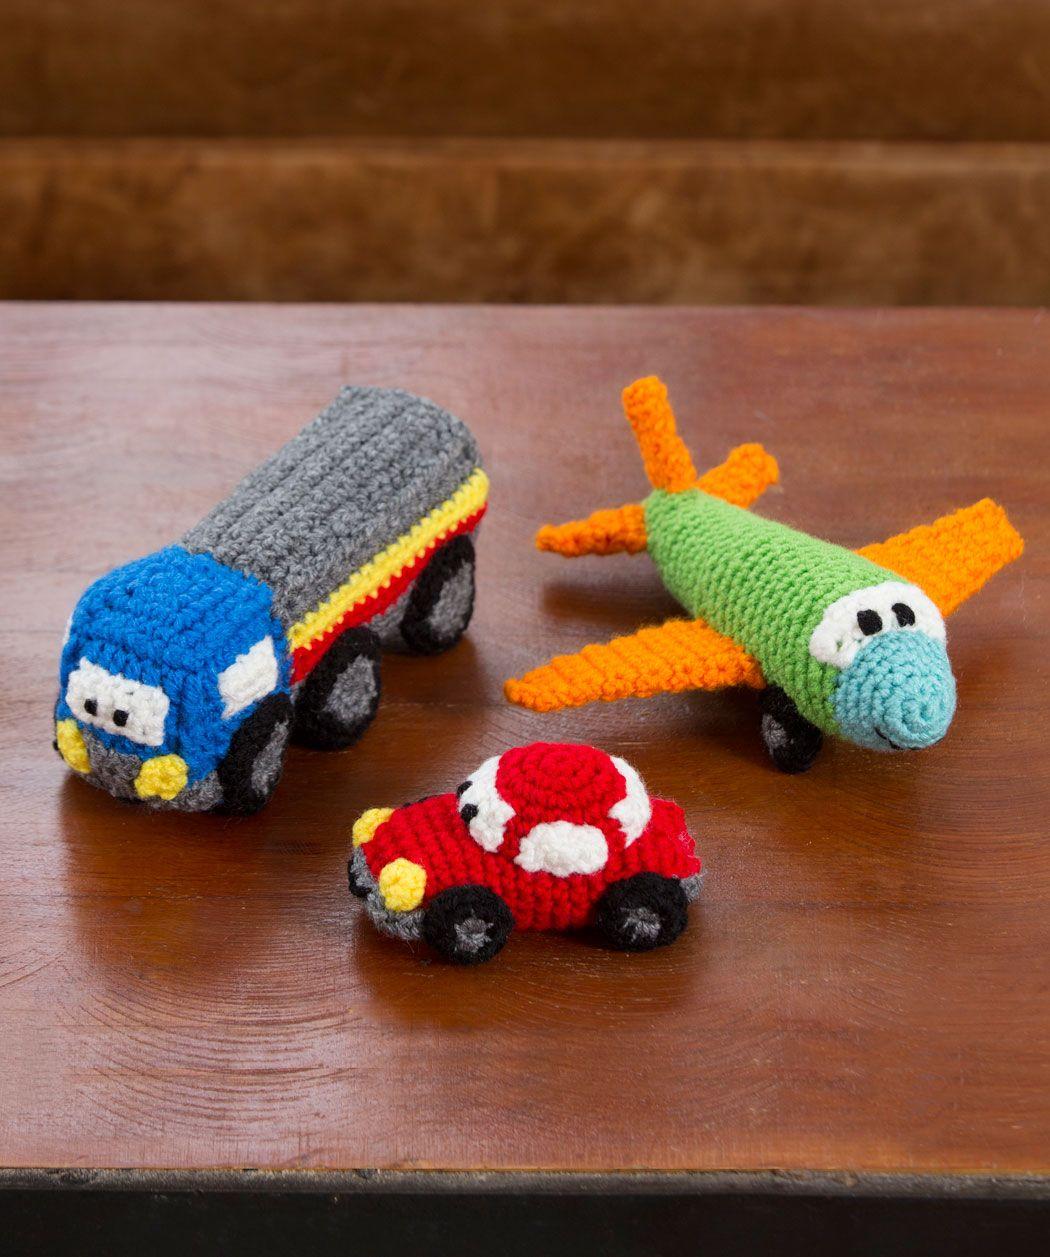 Diy Car Plane And Truck Amigurumi Toys